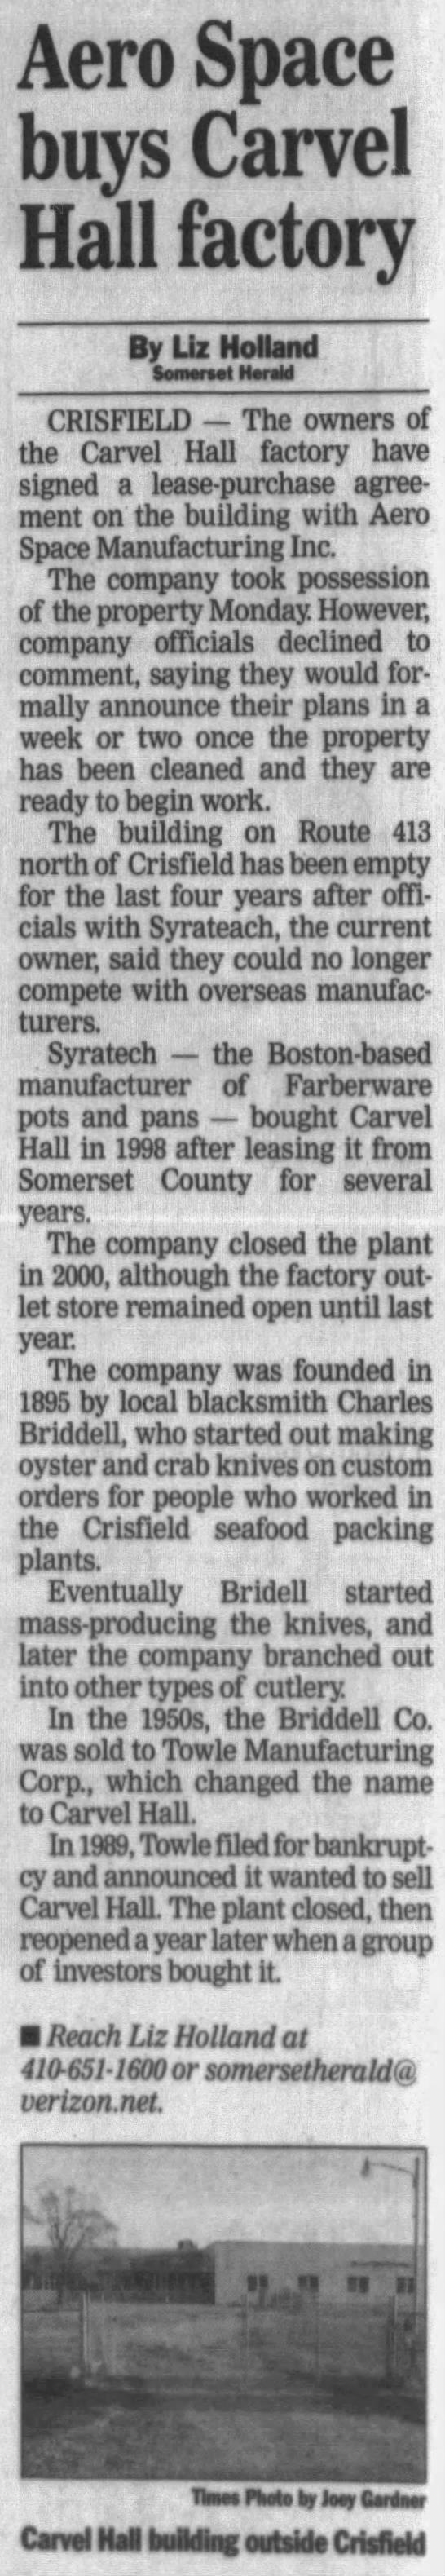 Carvel factory sale -